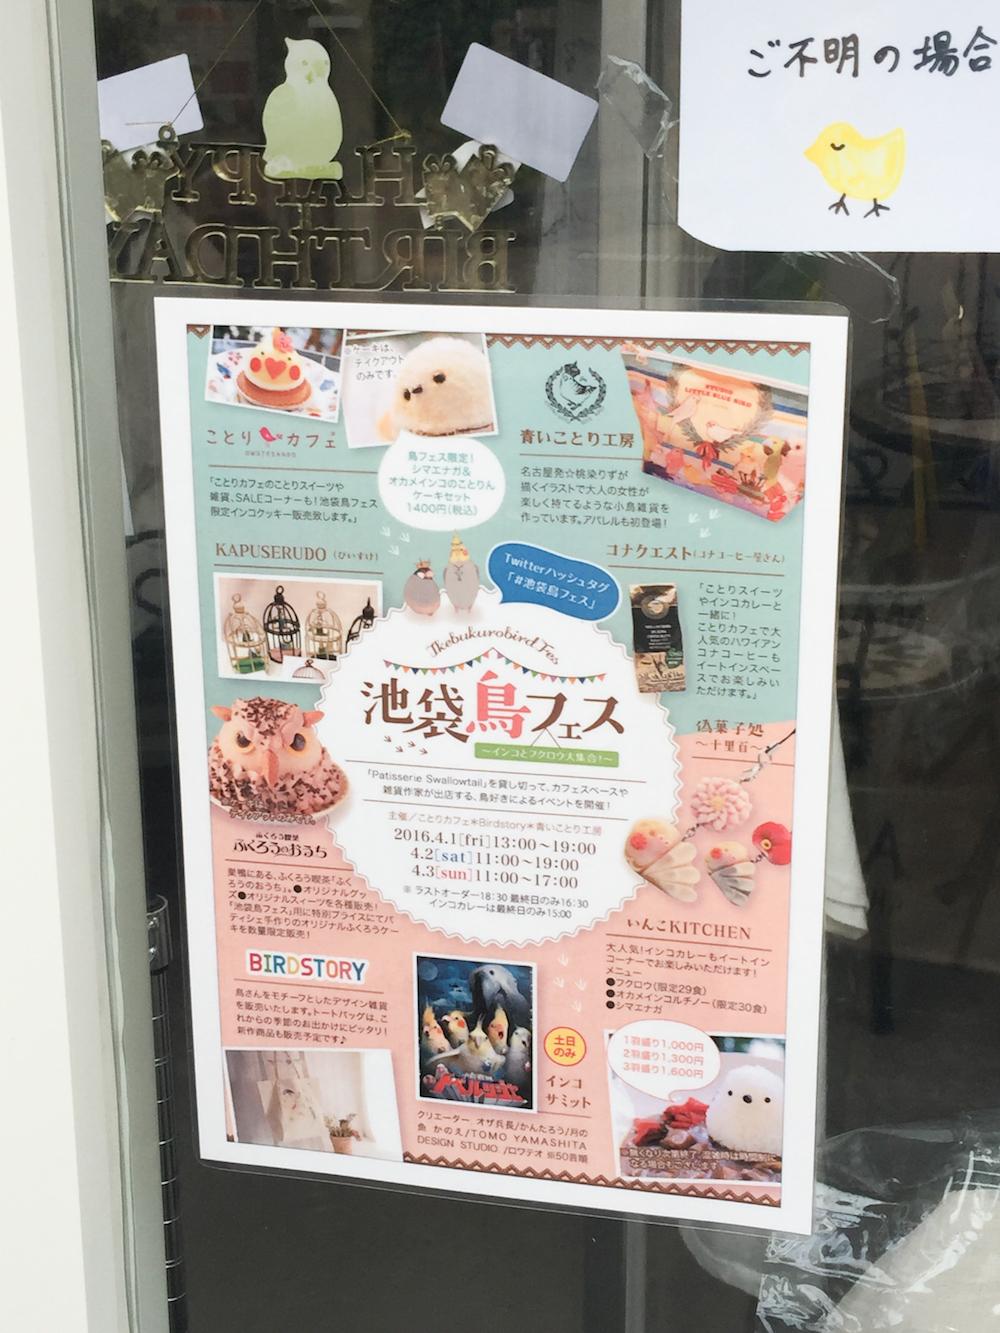 vogel-restaurant-menu-tokyo